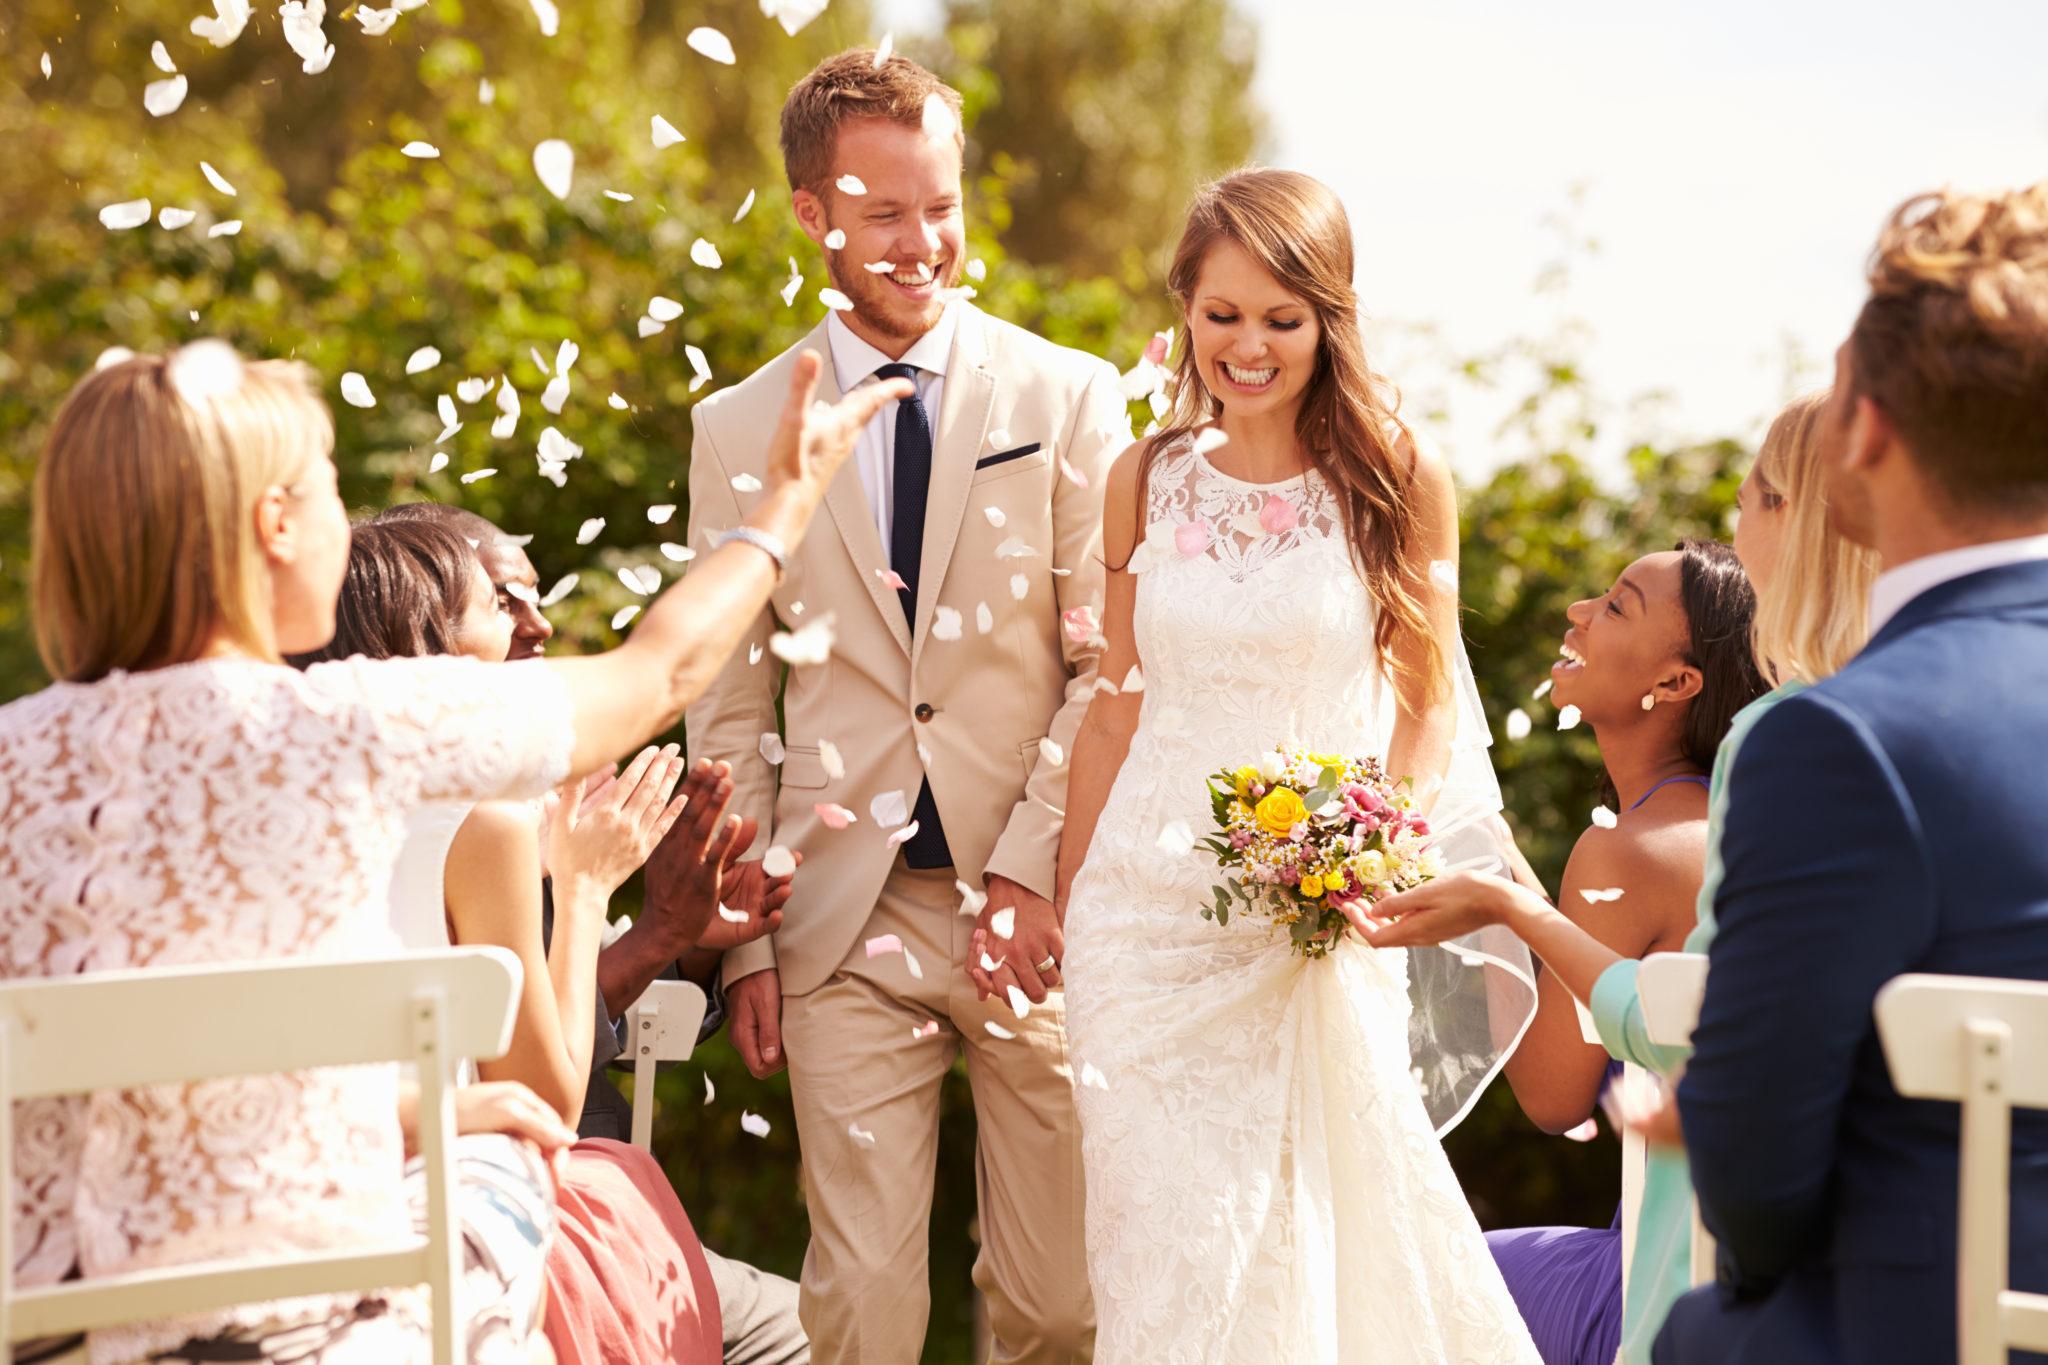 svadba bez stresu